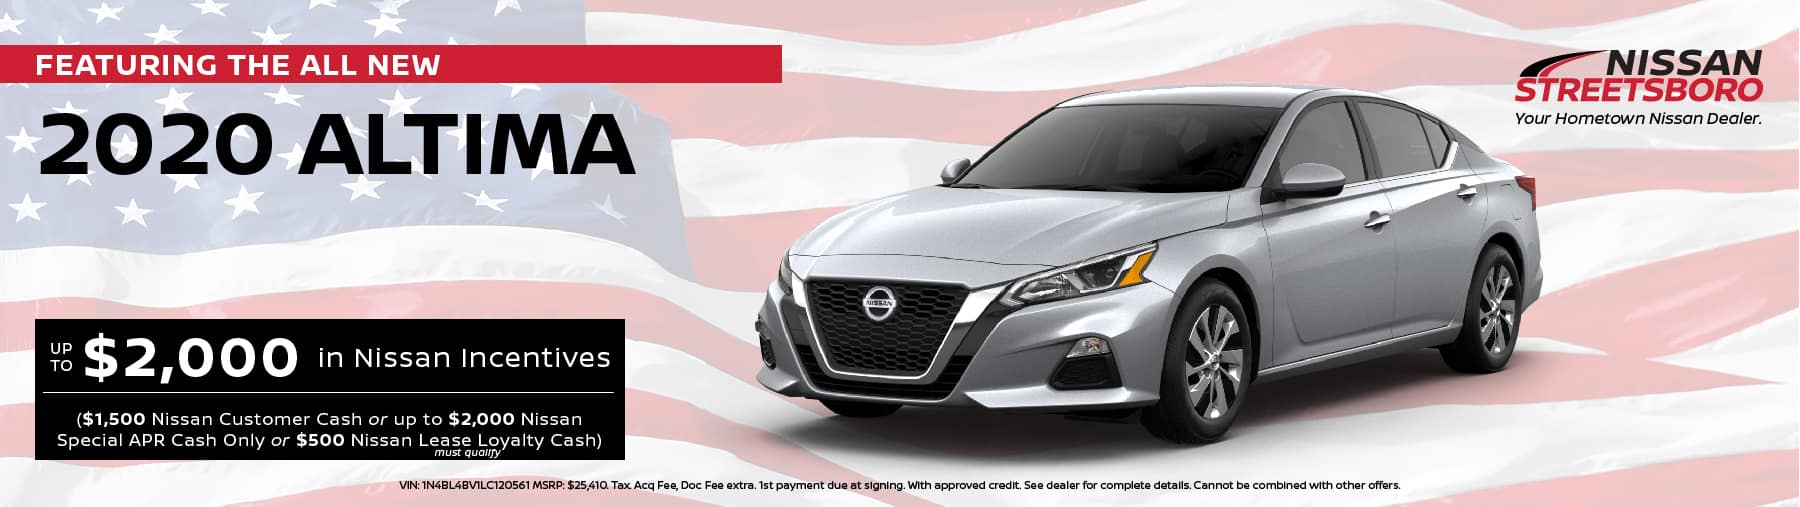 2020 Nissan Altima Incentives